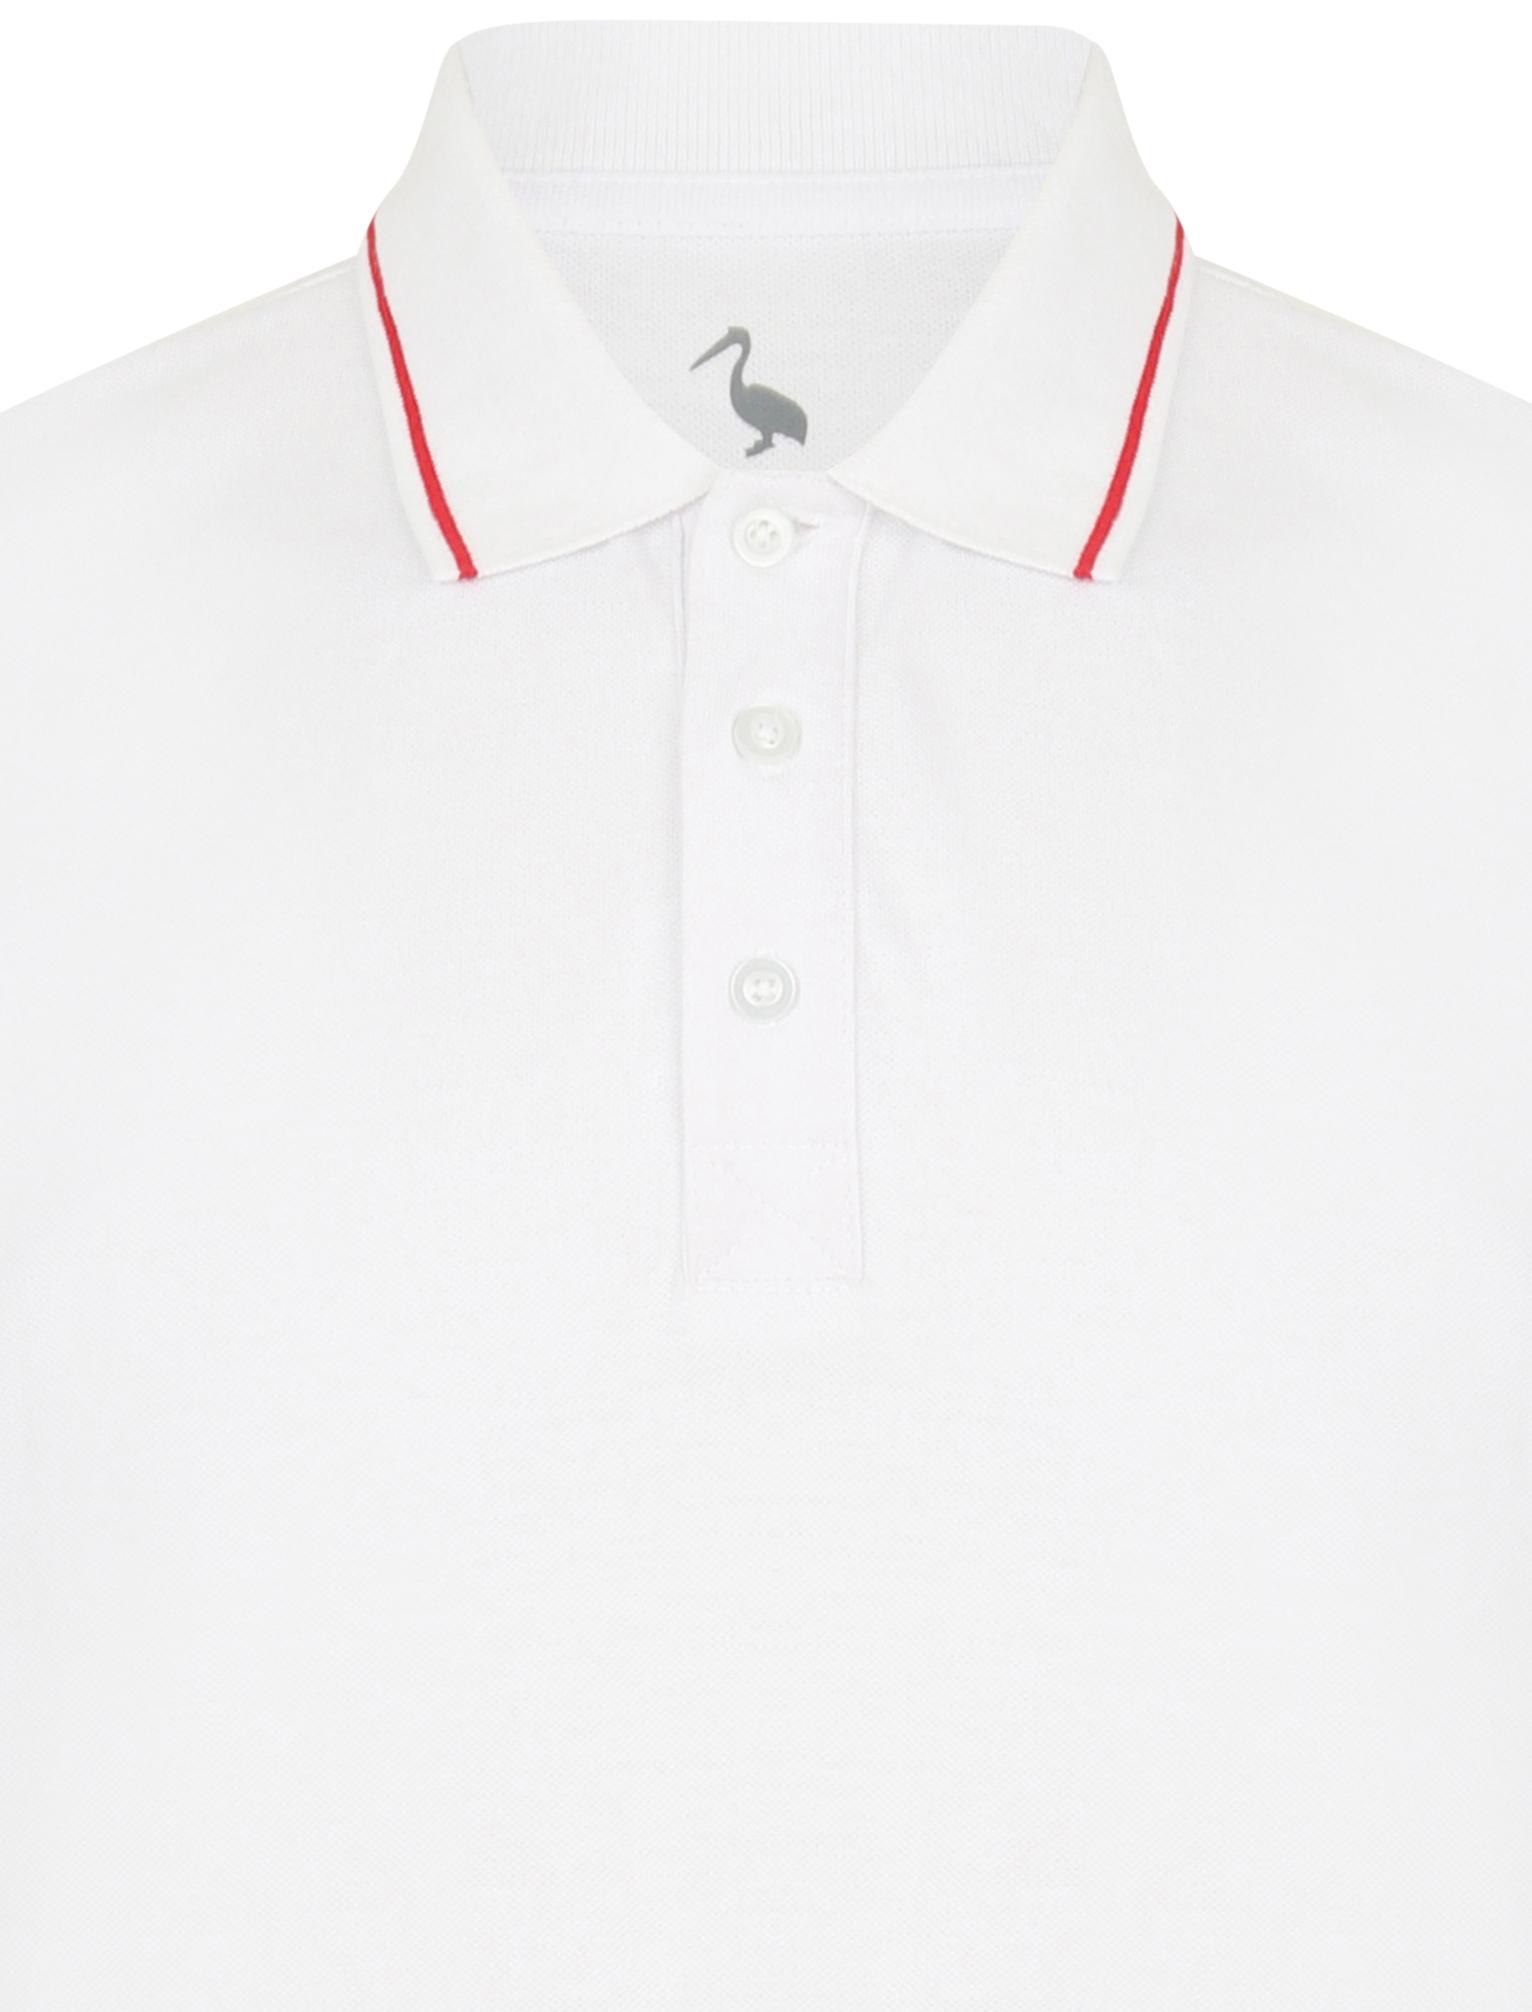 Sth-Shore-Mens-Plain-Polo-Shirt-100-Pique-Cotton-T-Shirt-Top-Collar-Size-M-XXL thumbnail 40